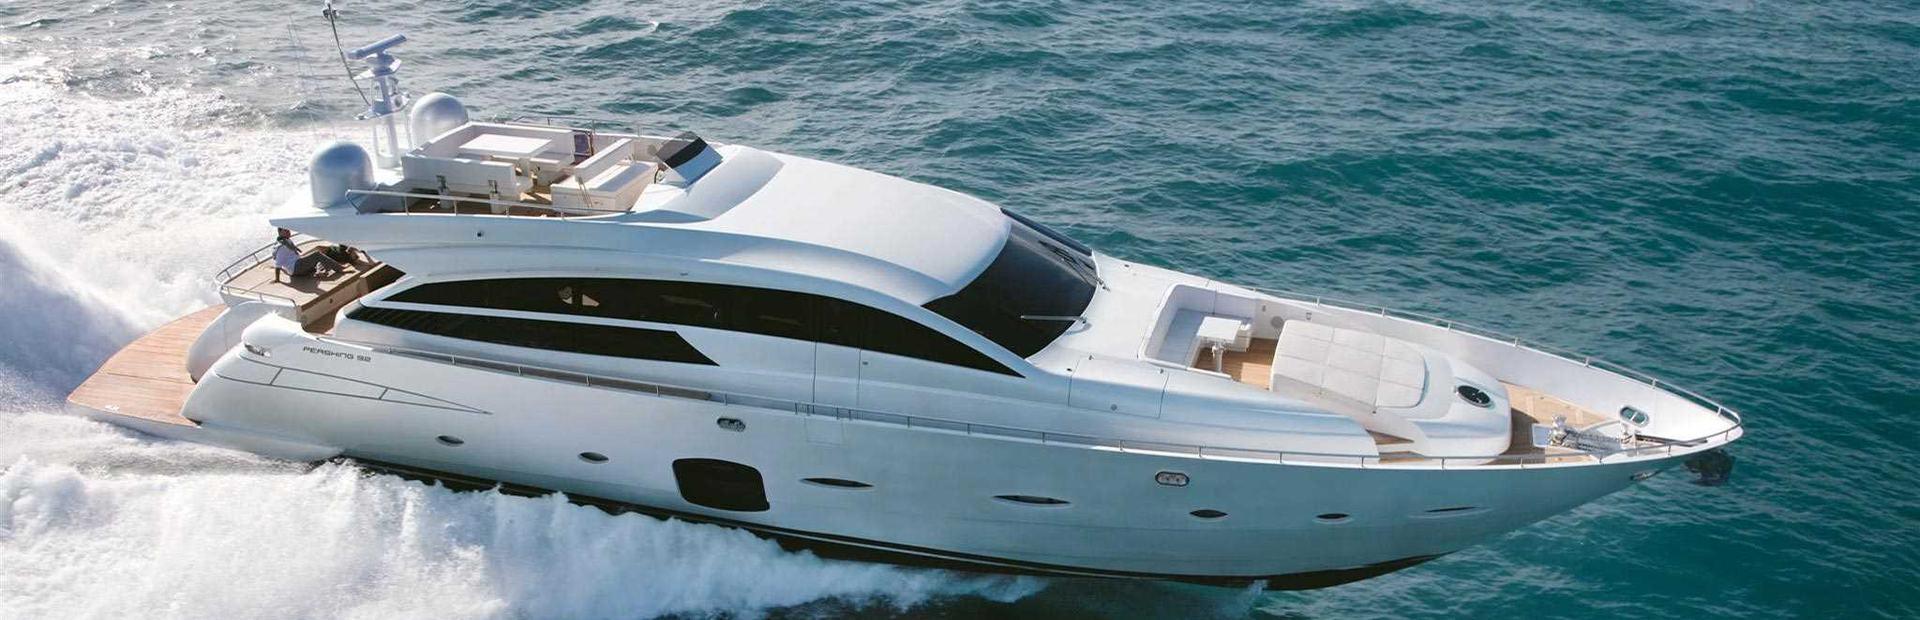 Pershing 92 Yacht Charter